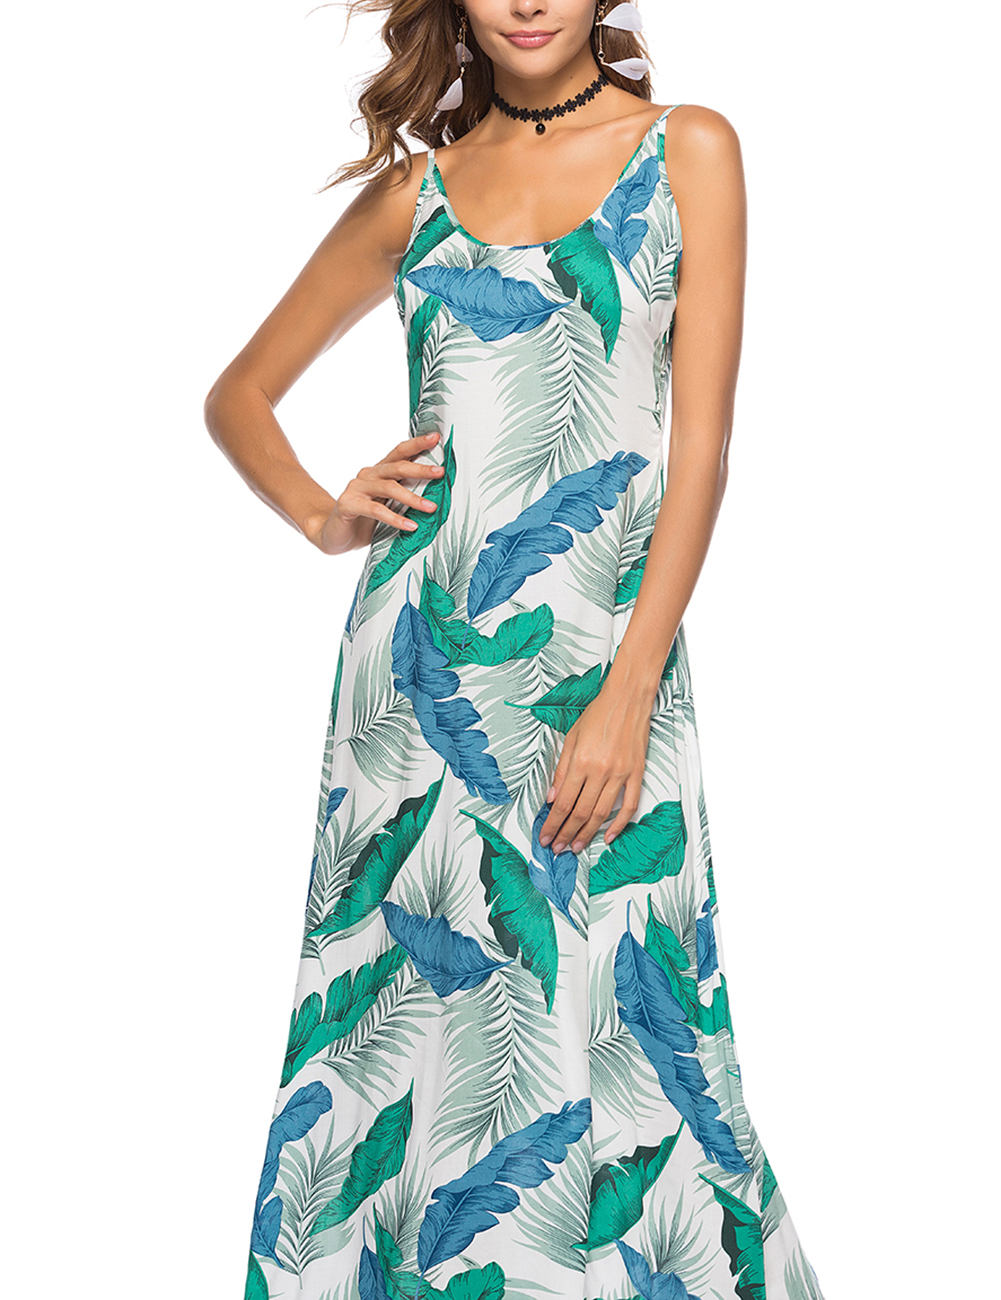 Bohemia Women Slip Dress Floral Print Summer Beach Evening Party ...